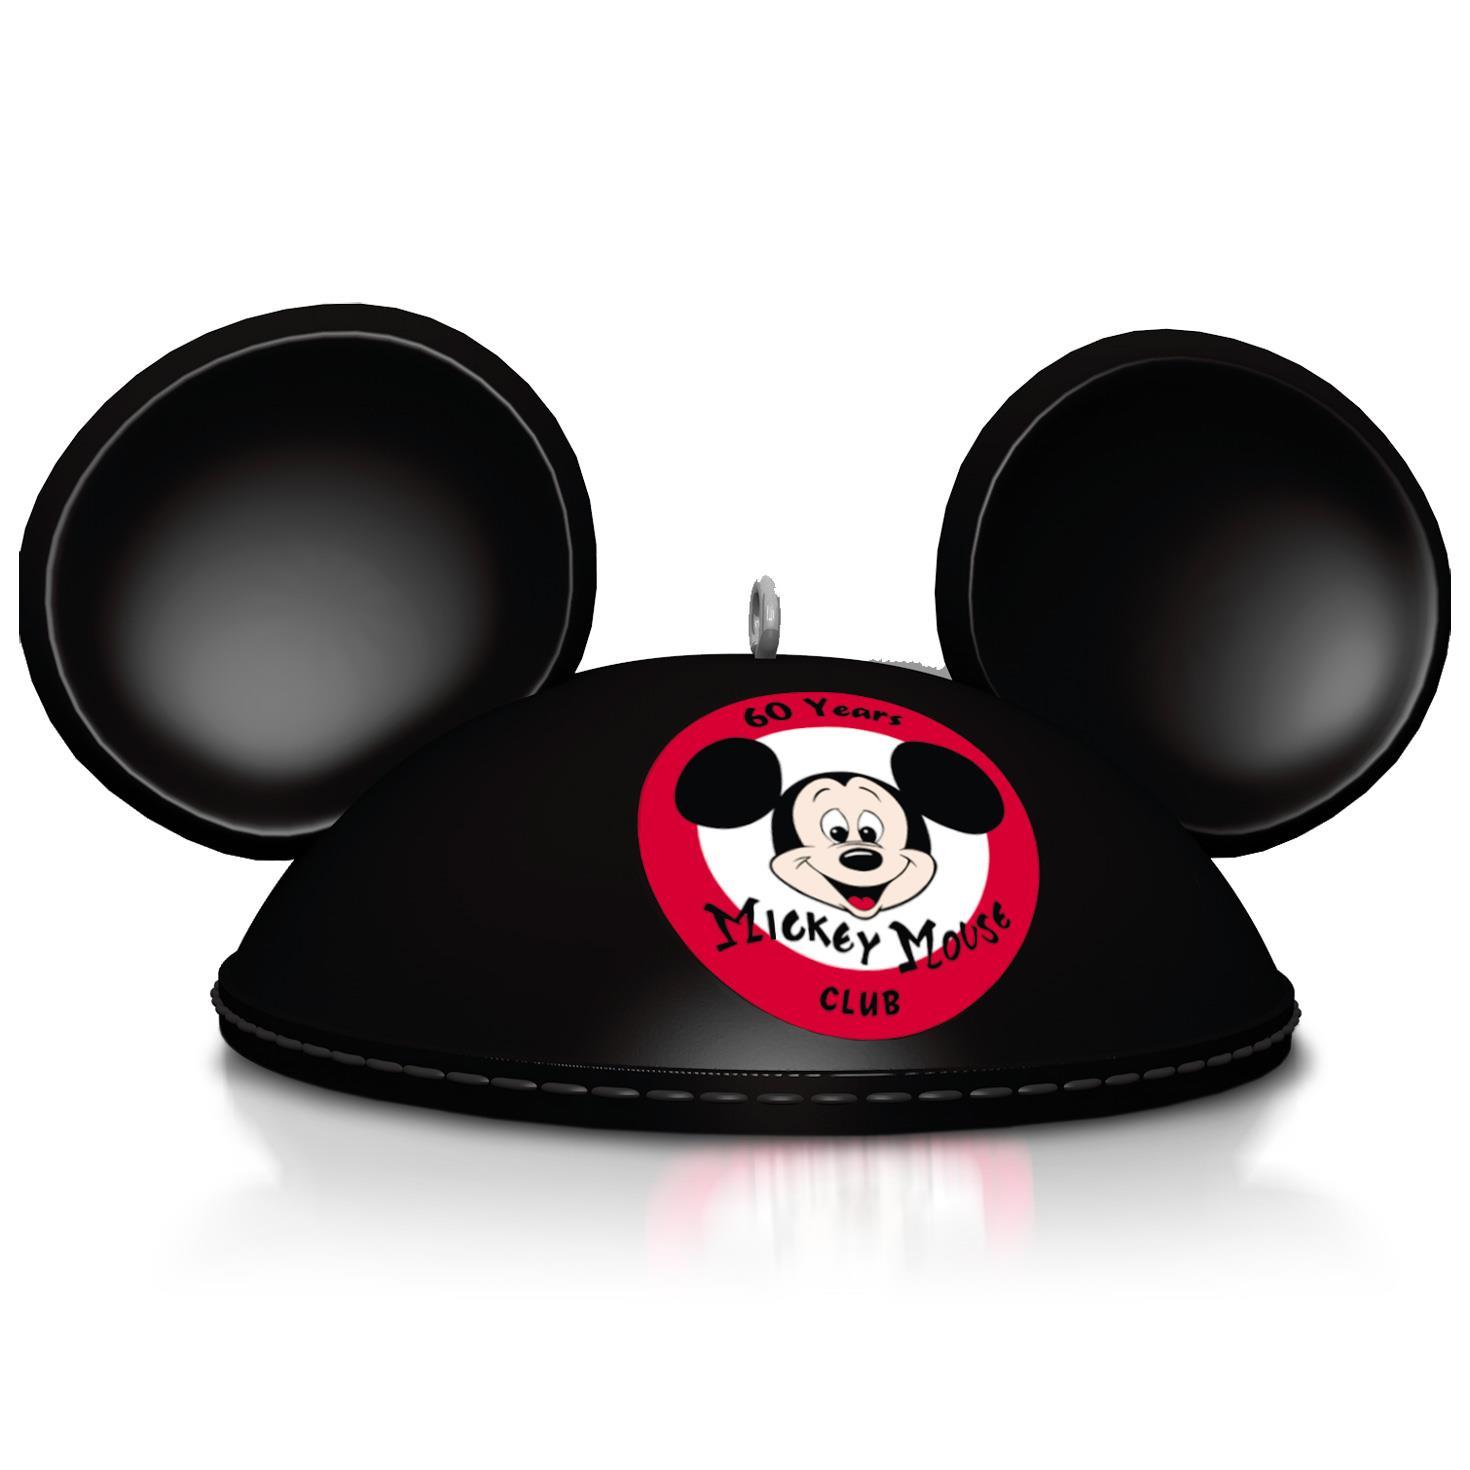 Disney The Mickey Mouse Club 60th Anniversary Ornament Keepsake 1470x1470